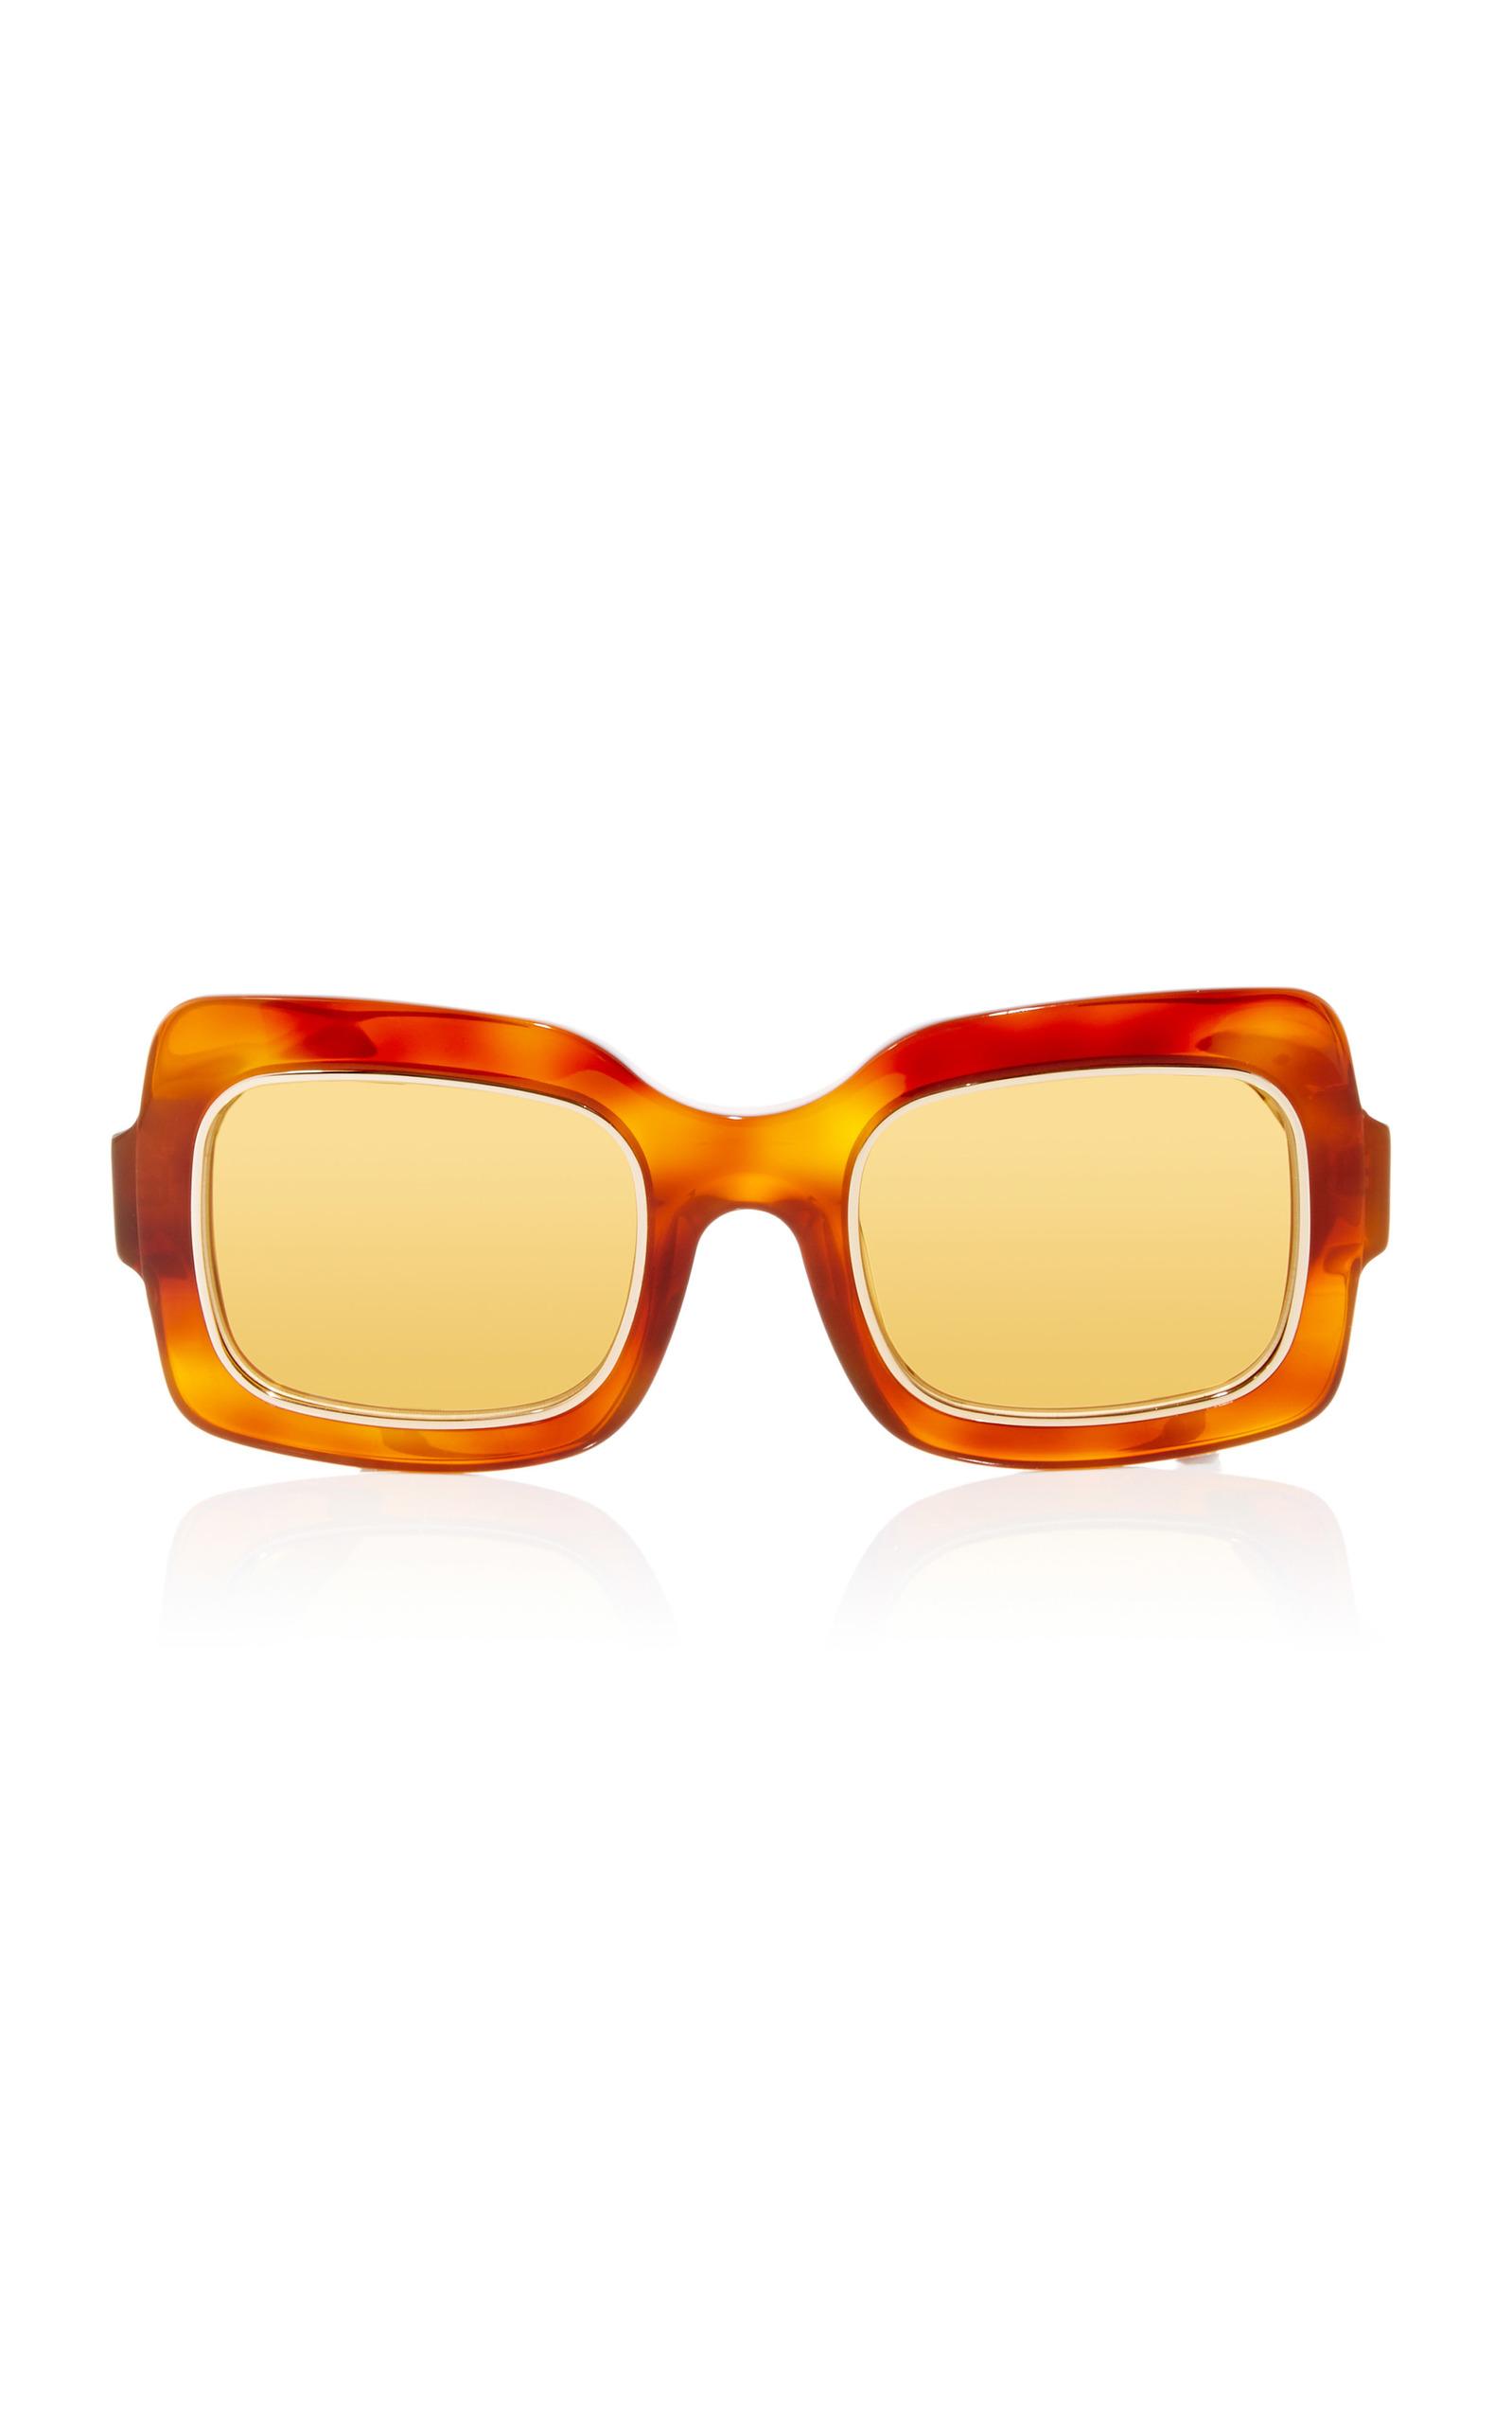 N°01 Caramel Acetate Sunglasses